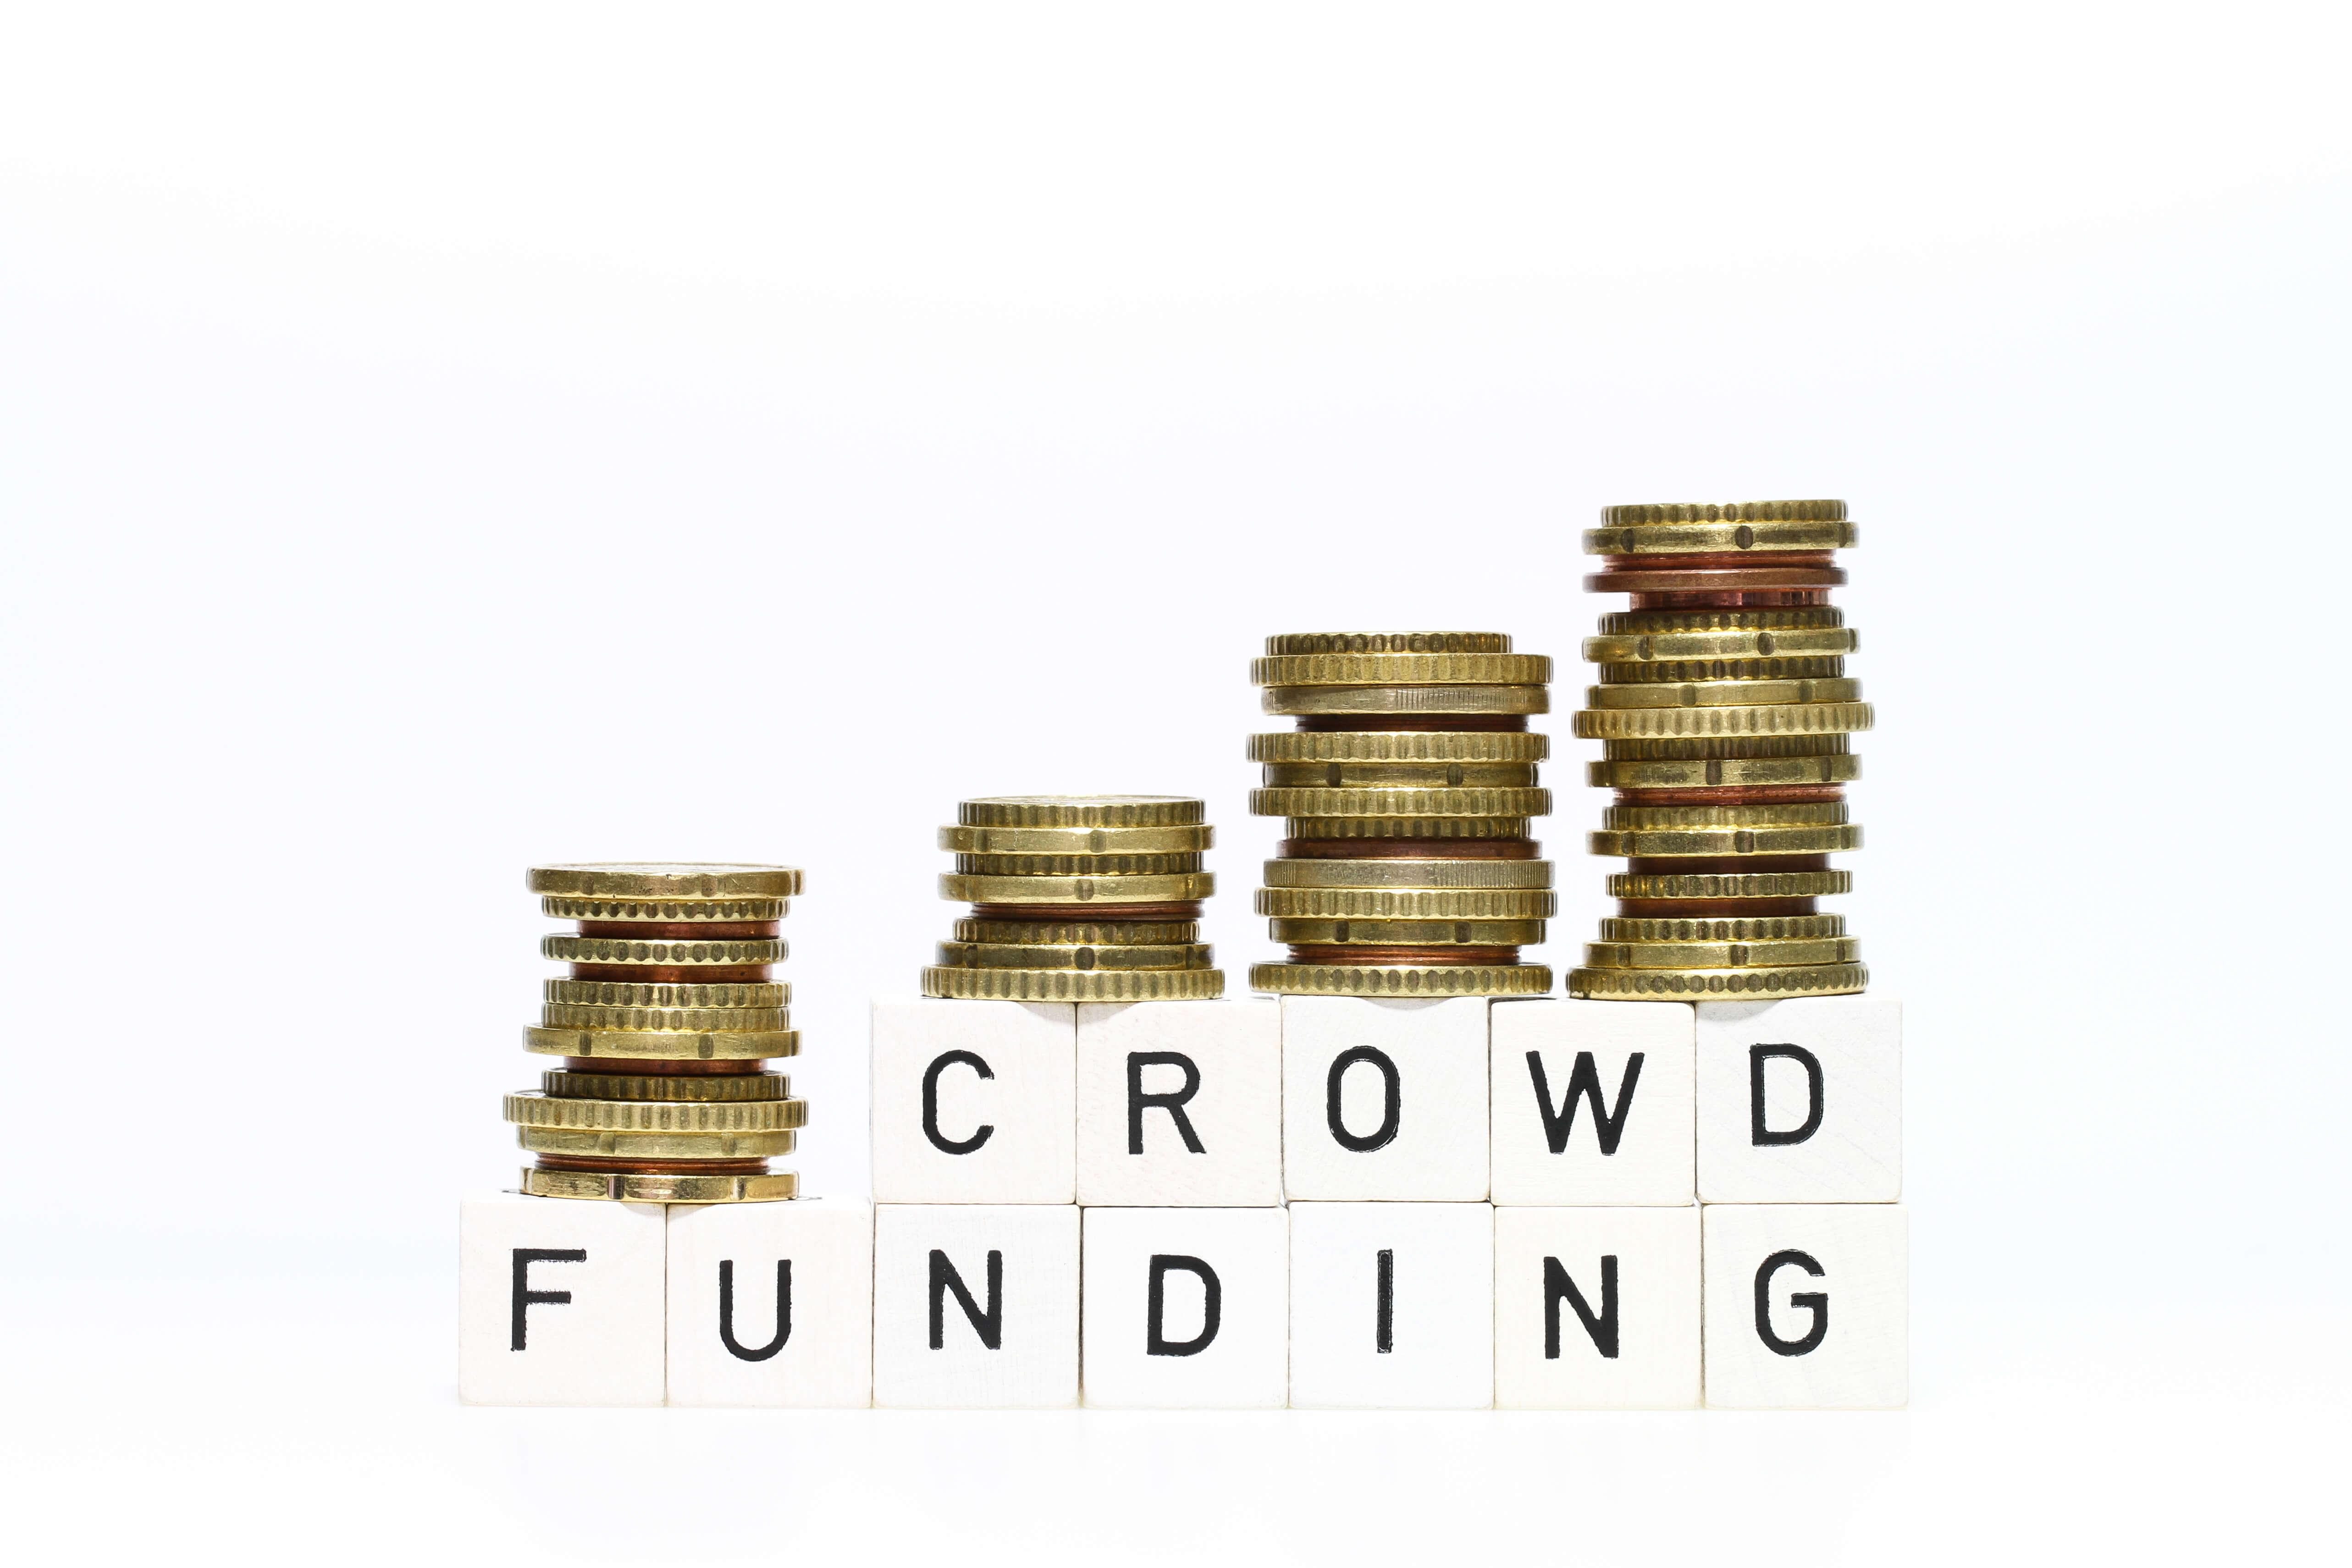 Using Kickstarter to fund your idea